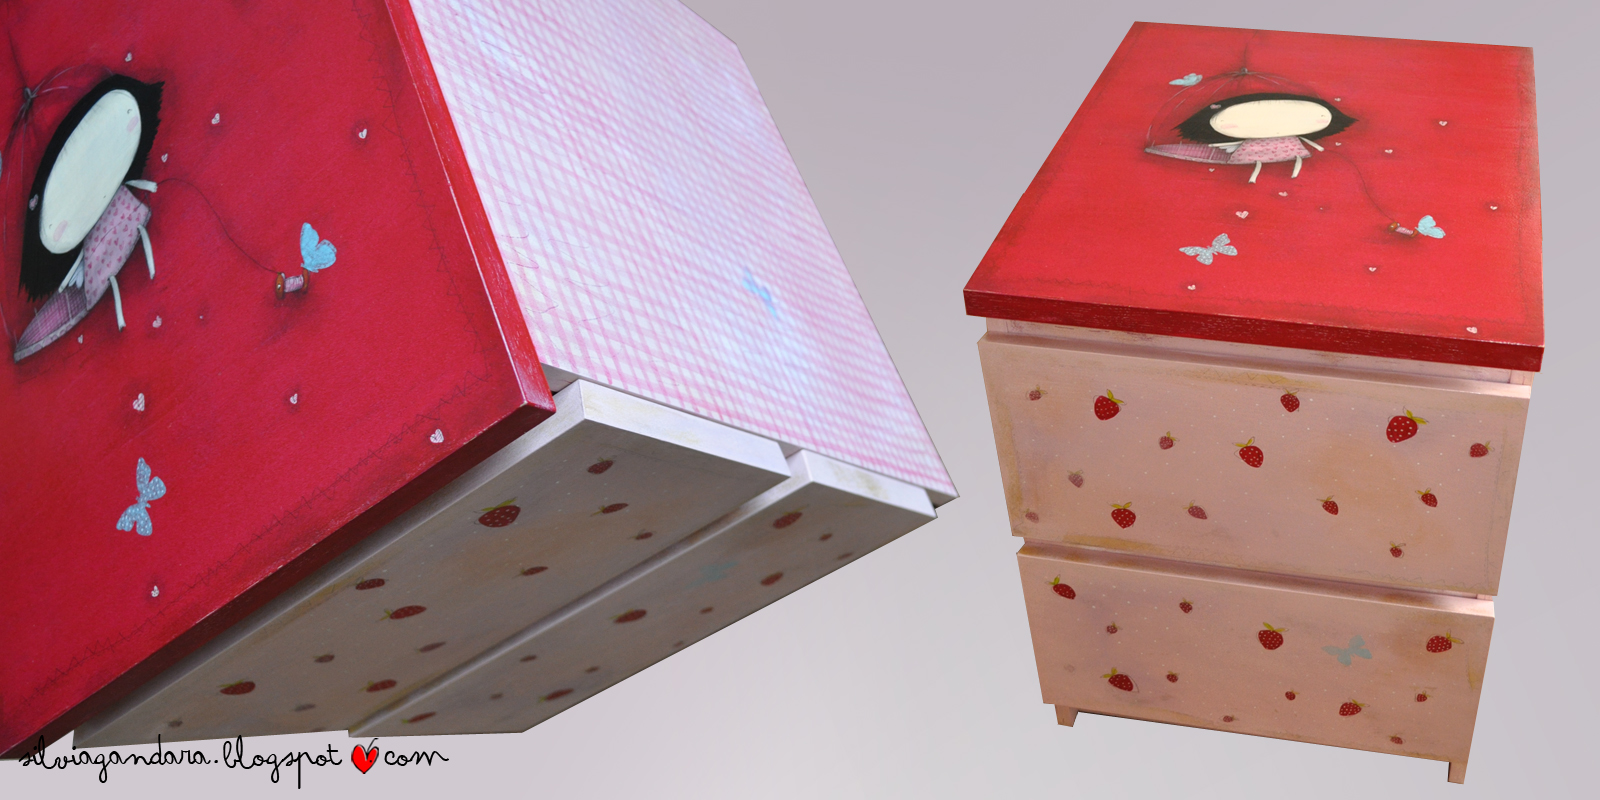 Silvia g ndara mesilla malm personalizada - Ikea mesilla malm ...